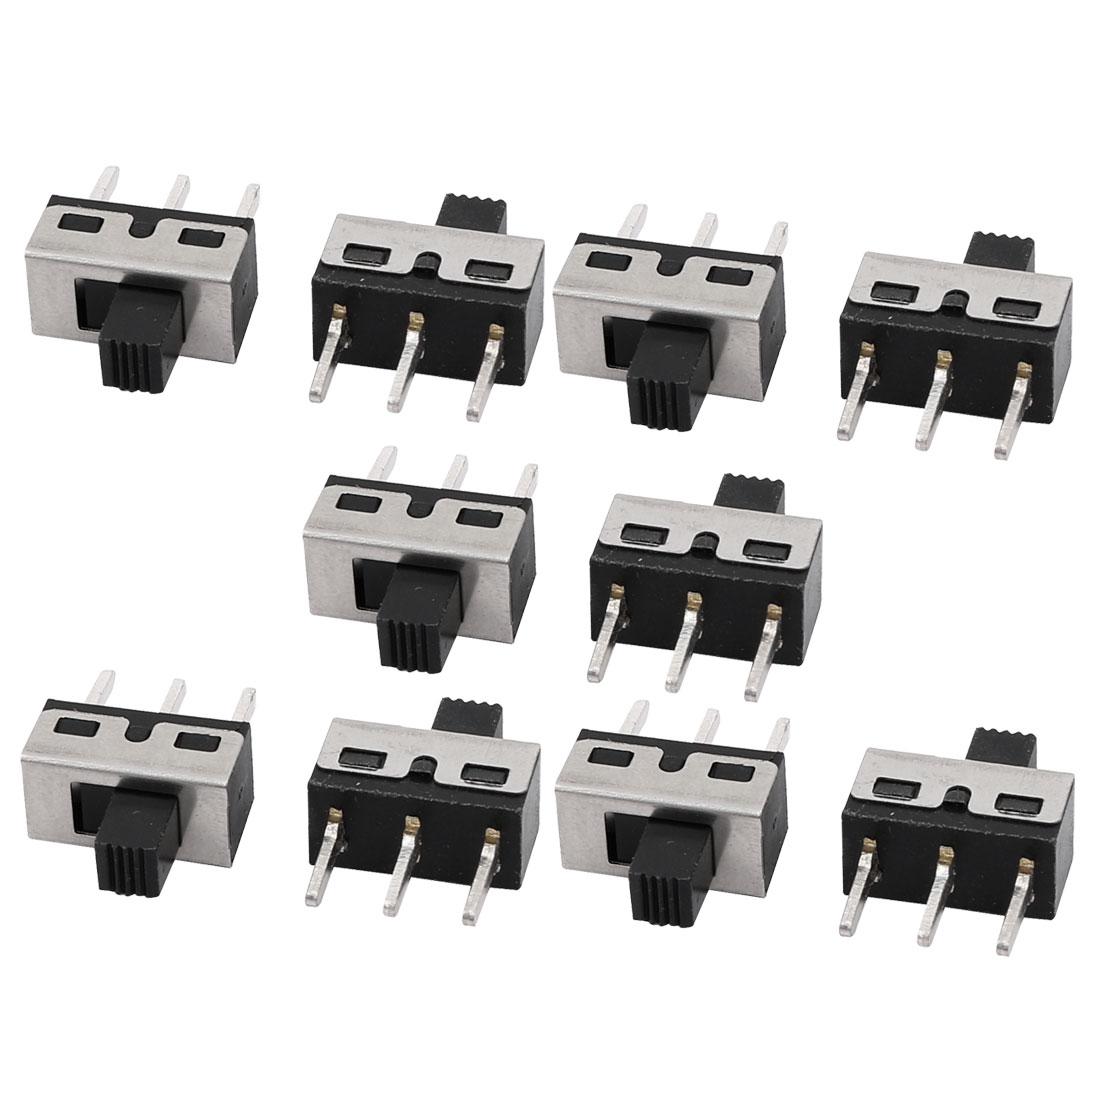 10Pcs AC 125V 3A 2 Position SPDT 3 Terminal PCB Mounting Mini Slide Switch